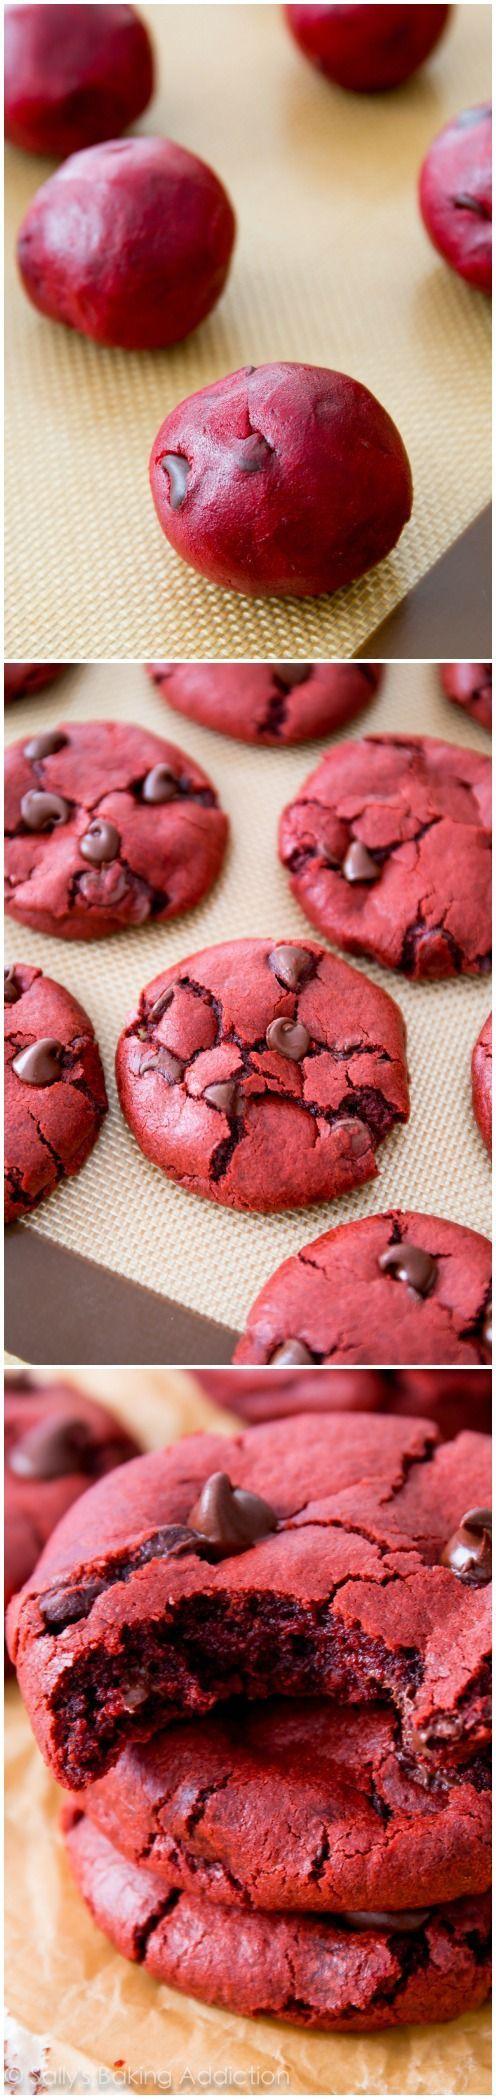 Soft-baked red velvet chocolate chip cookie recipe made from scratch! Recipe on sallysbakingaddiction.com